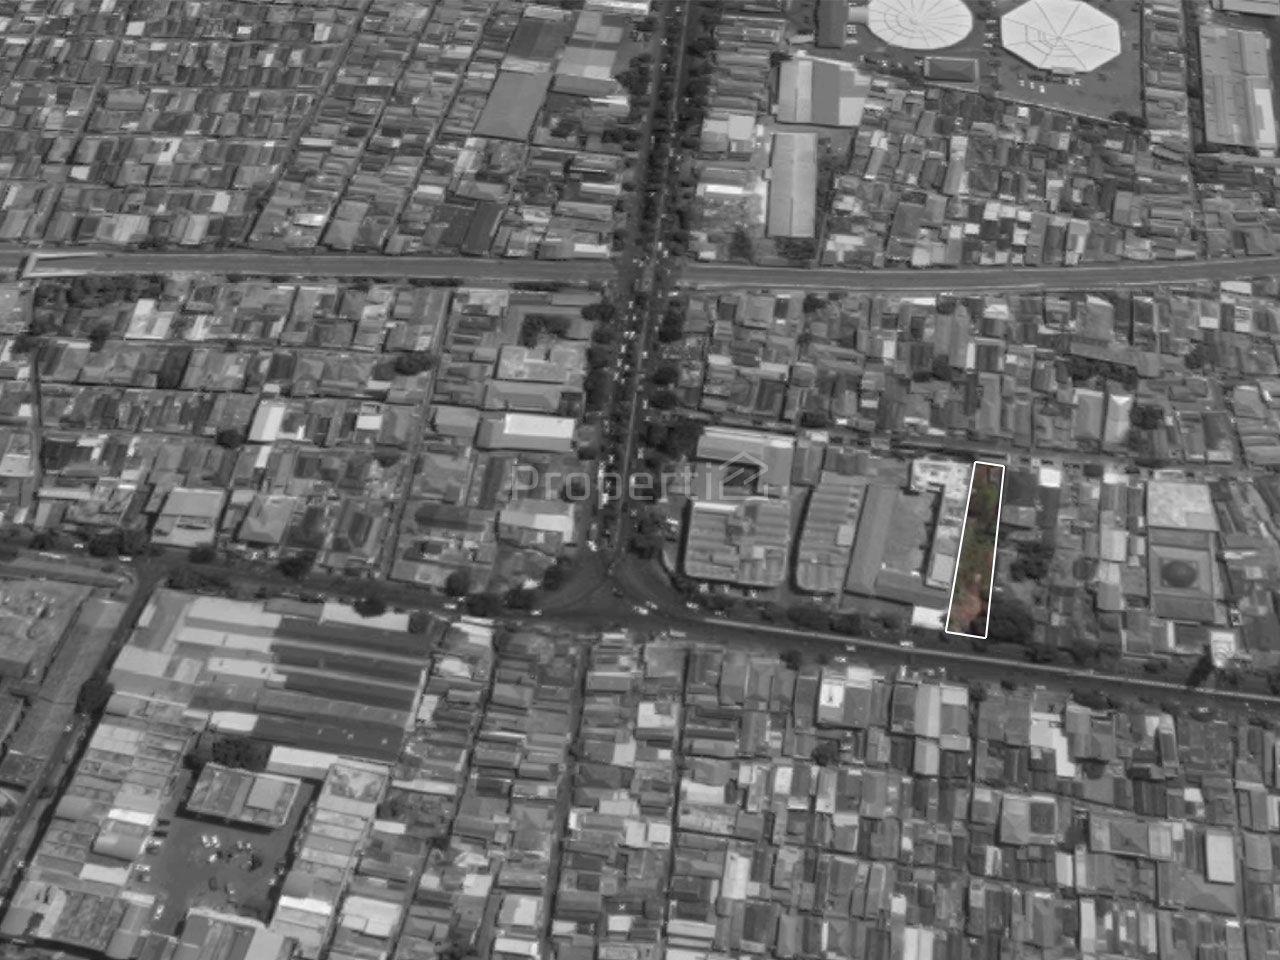 Land Ready to Build at Jalan Tembok Dukuh Surabaya City, Jawa Timur